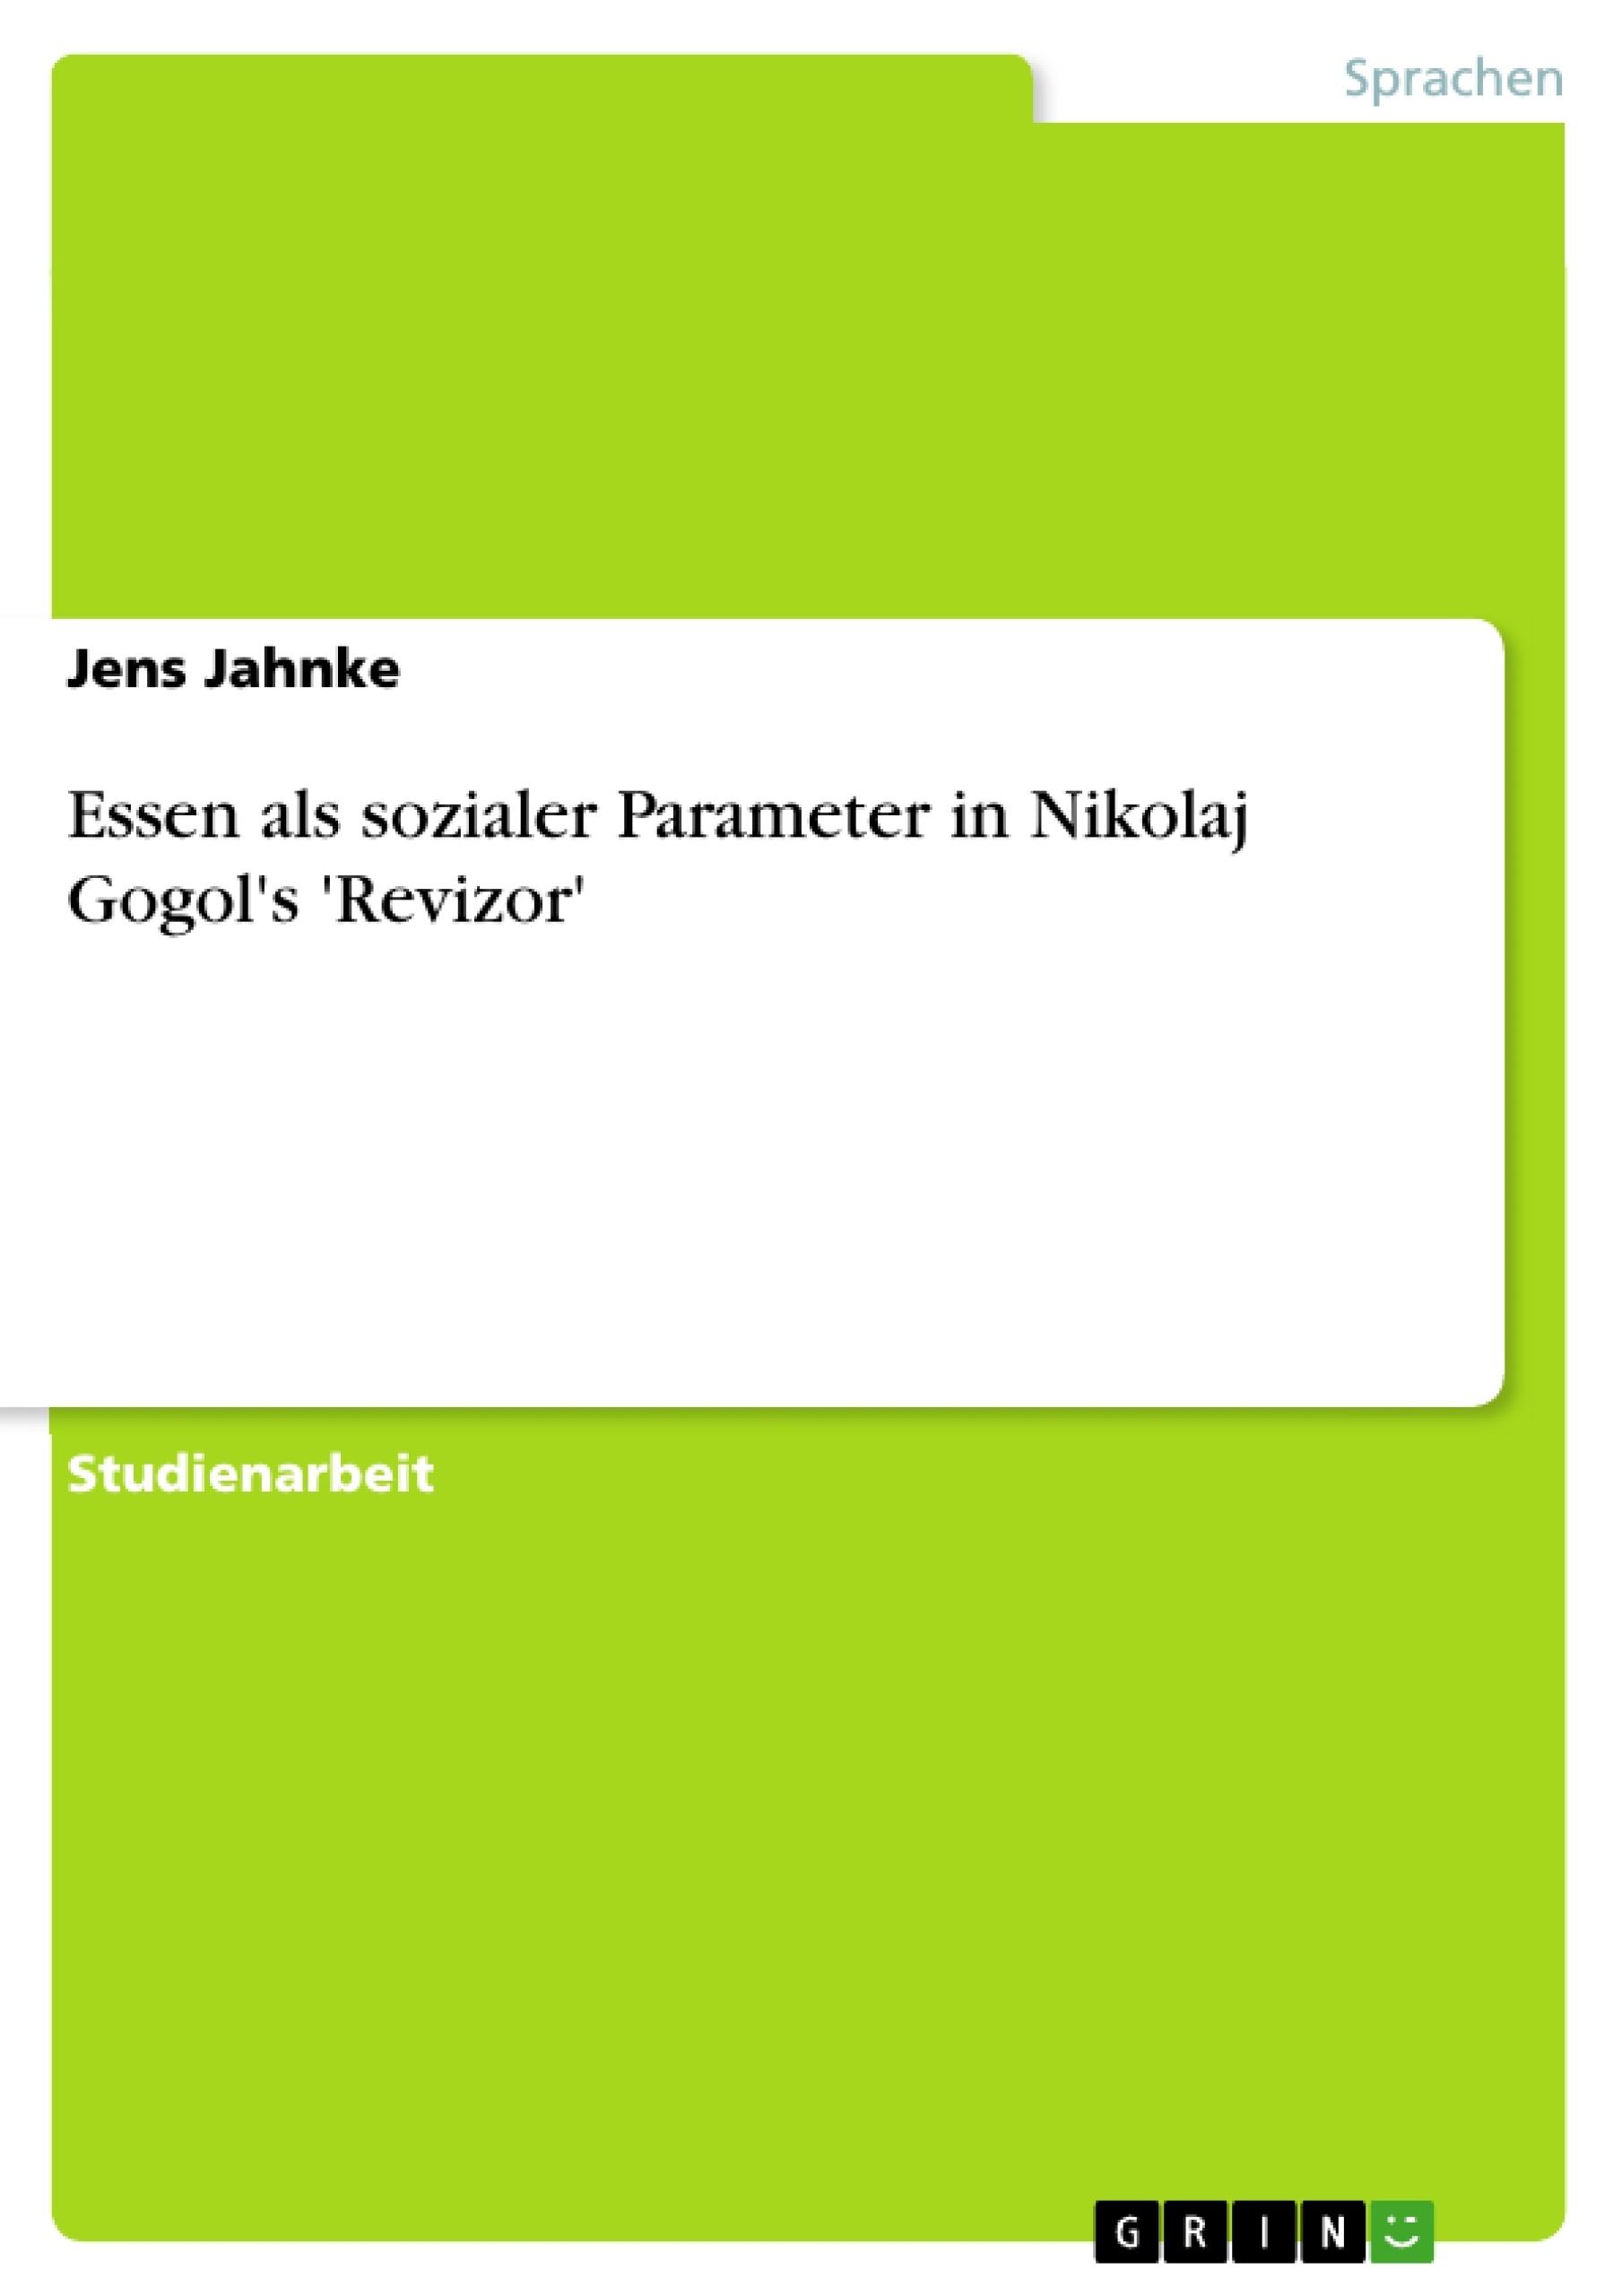 Titel: Essen als sozialer Parameter in Nikolaj Gogol's 'Revizor'